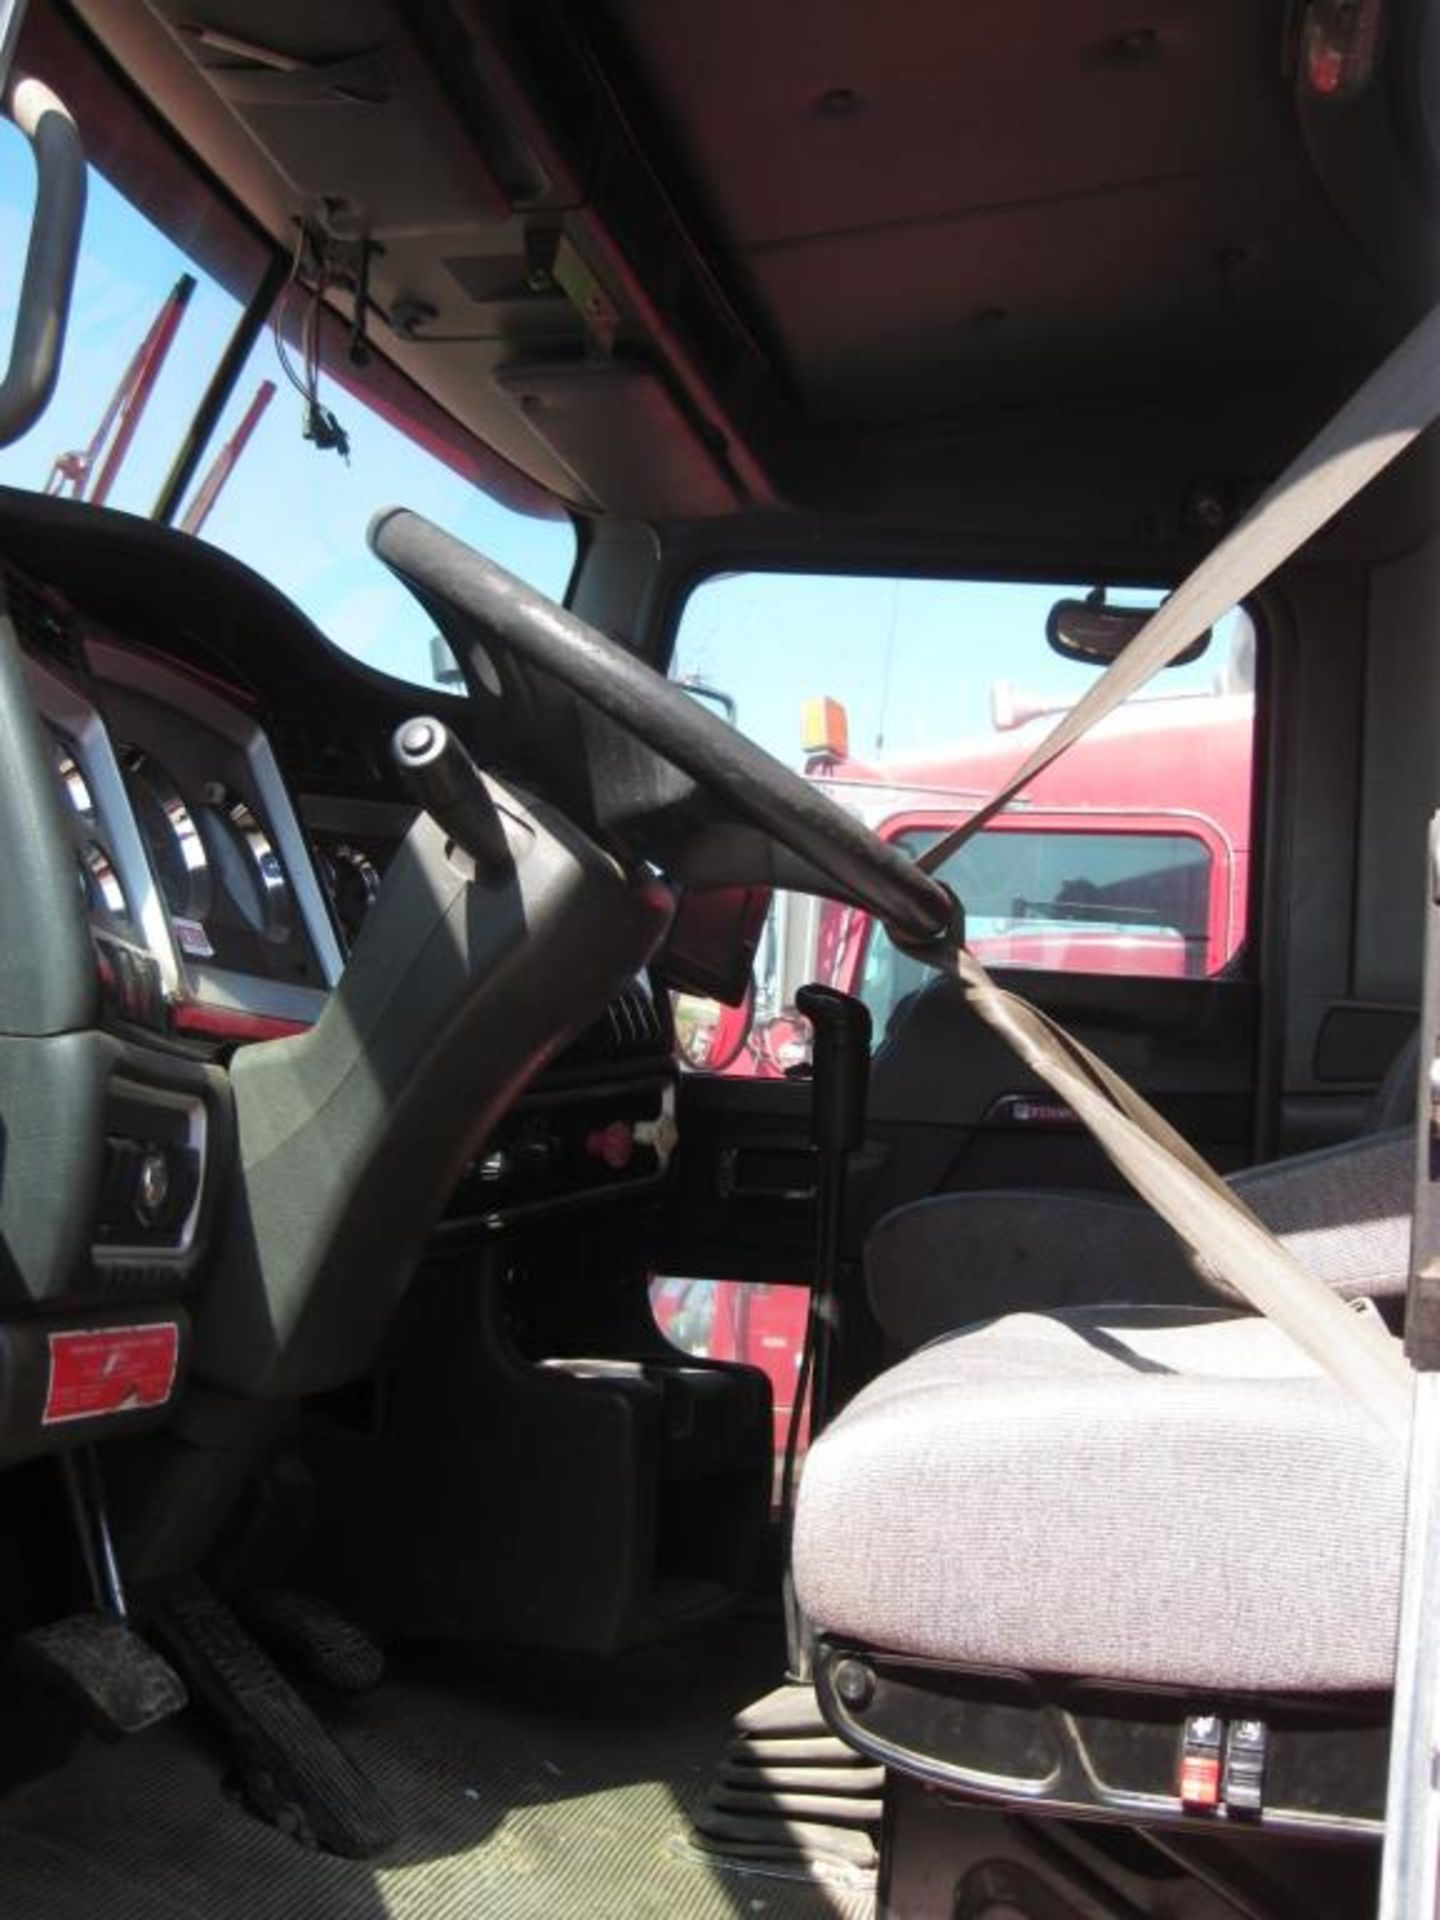 Kenworth Truck - Image 9 of 21